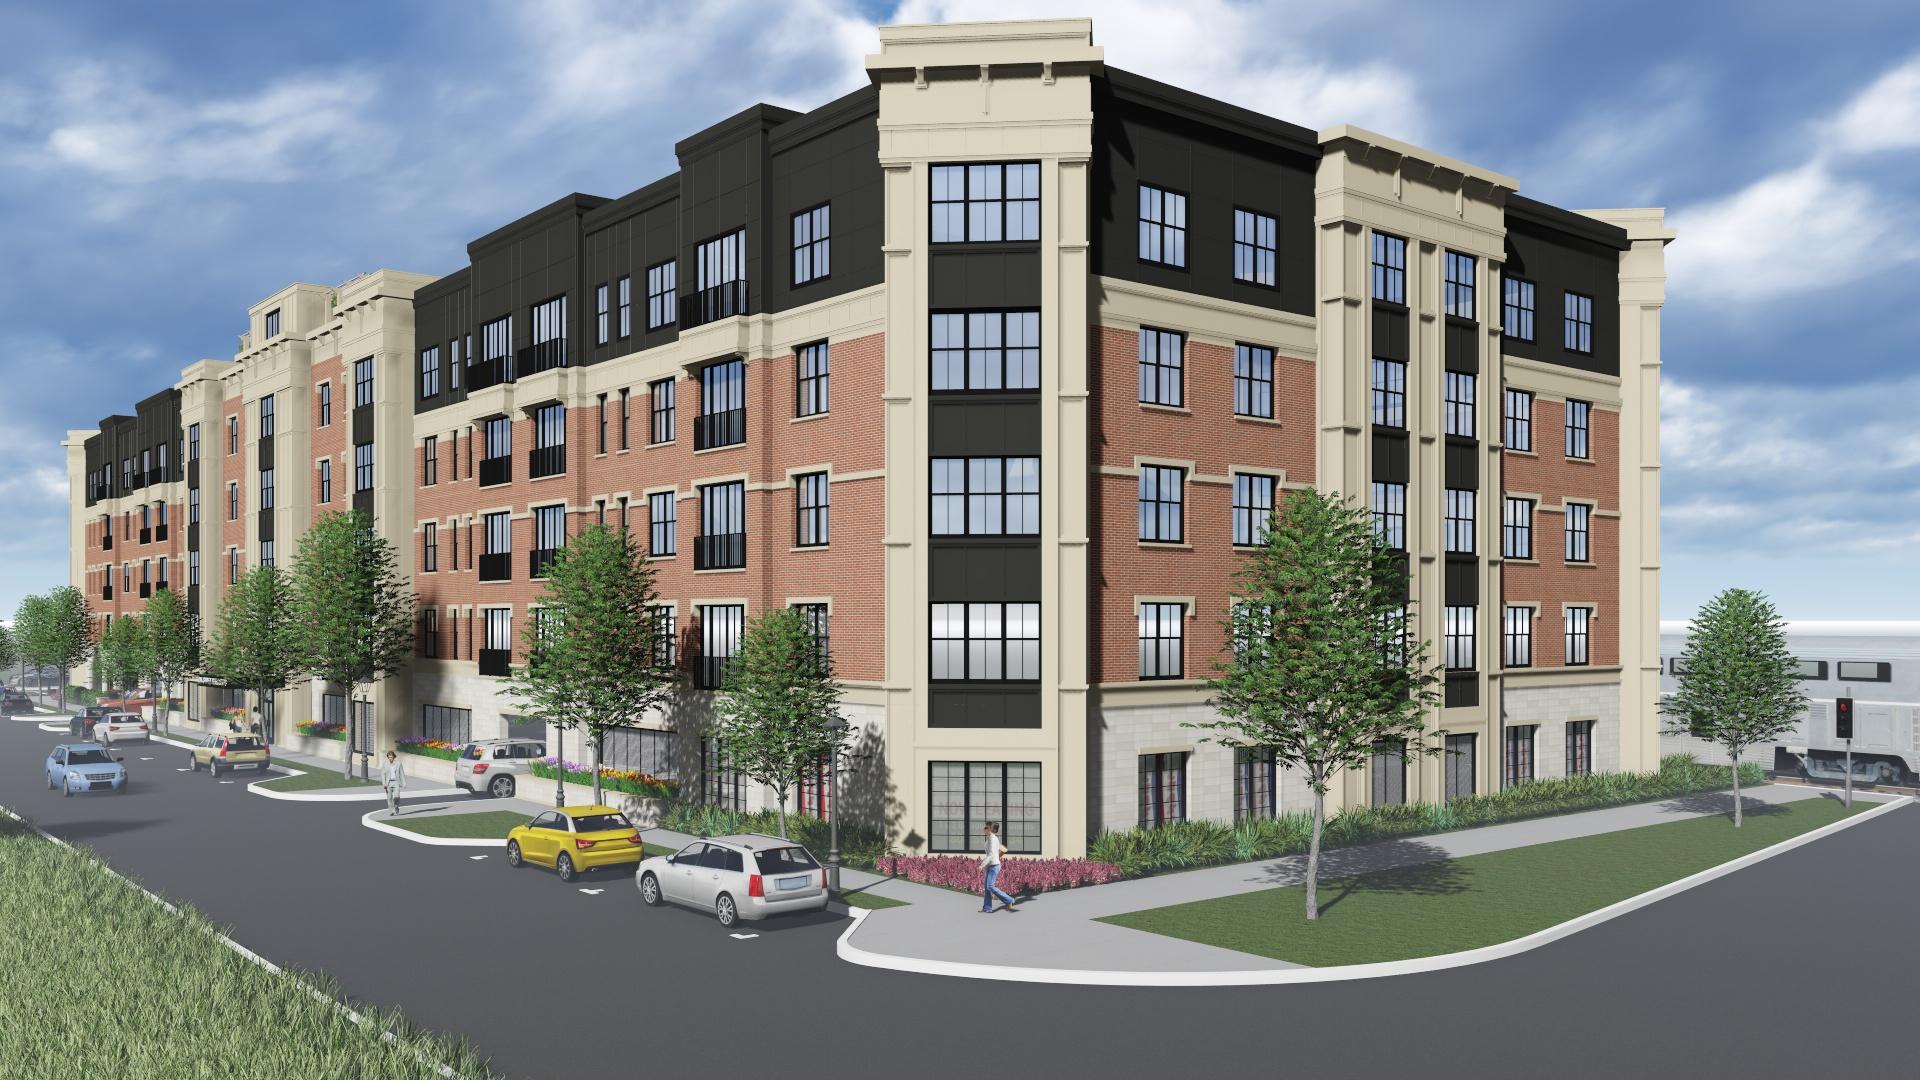 2015.12.01_Oak Street Apartments_V07.jpg